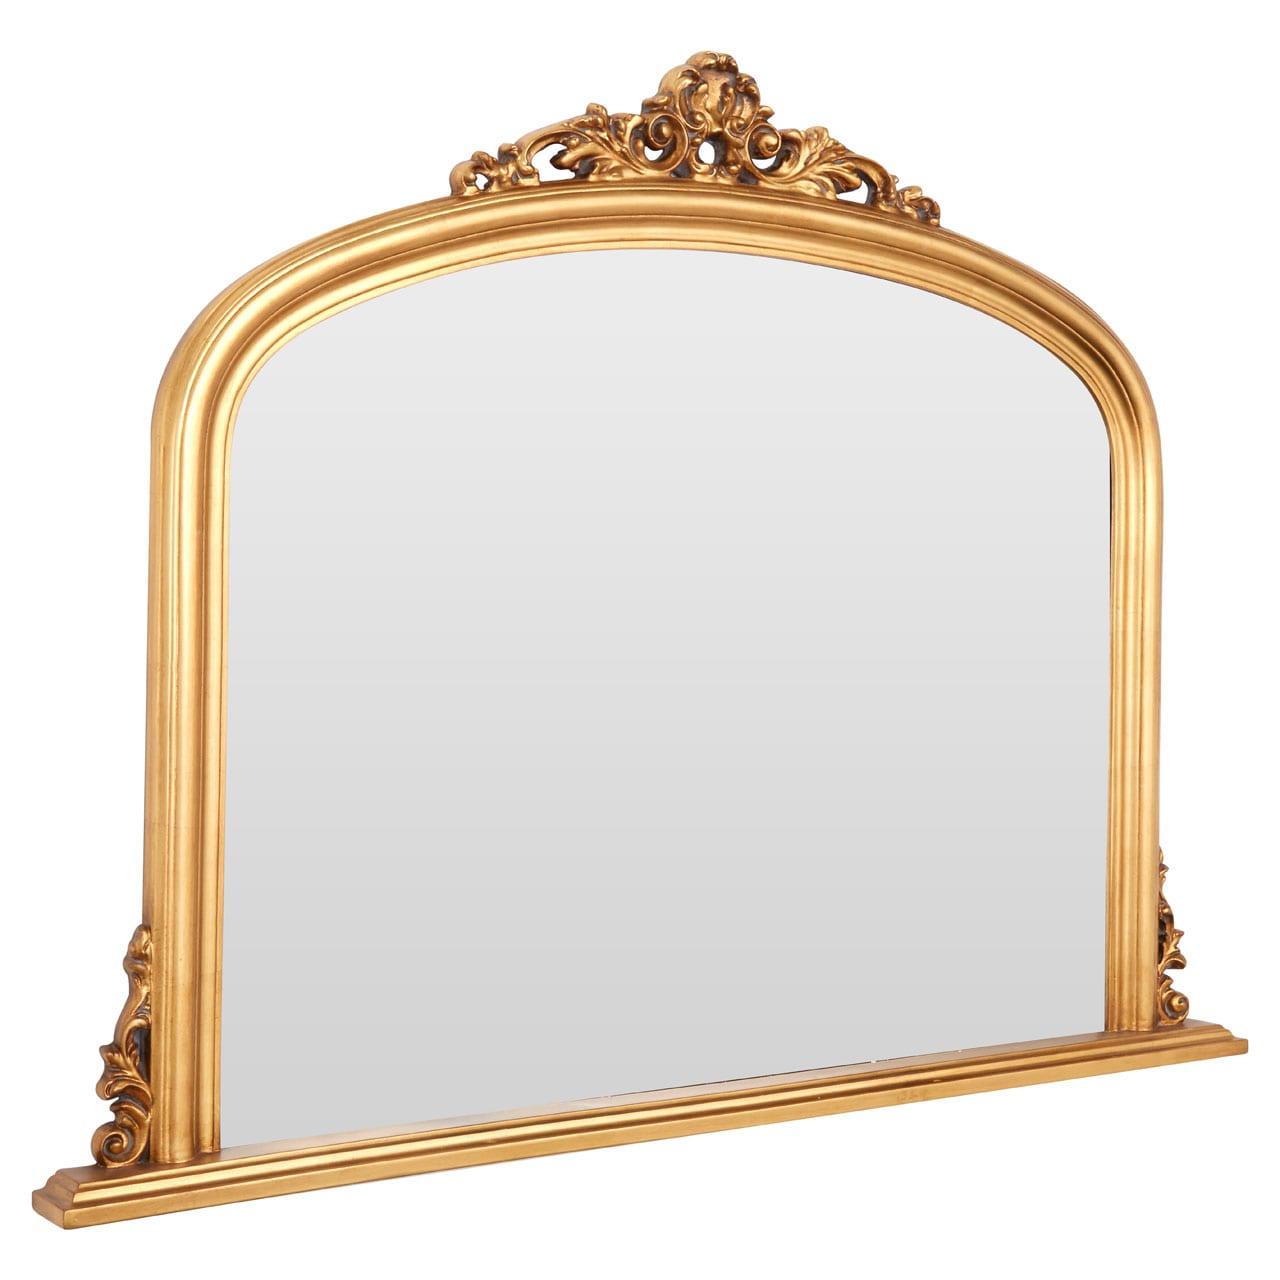 Kingsley Gold Wall Mirror